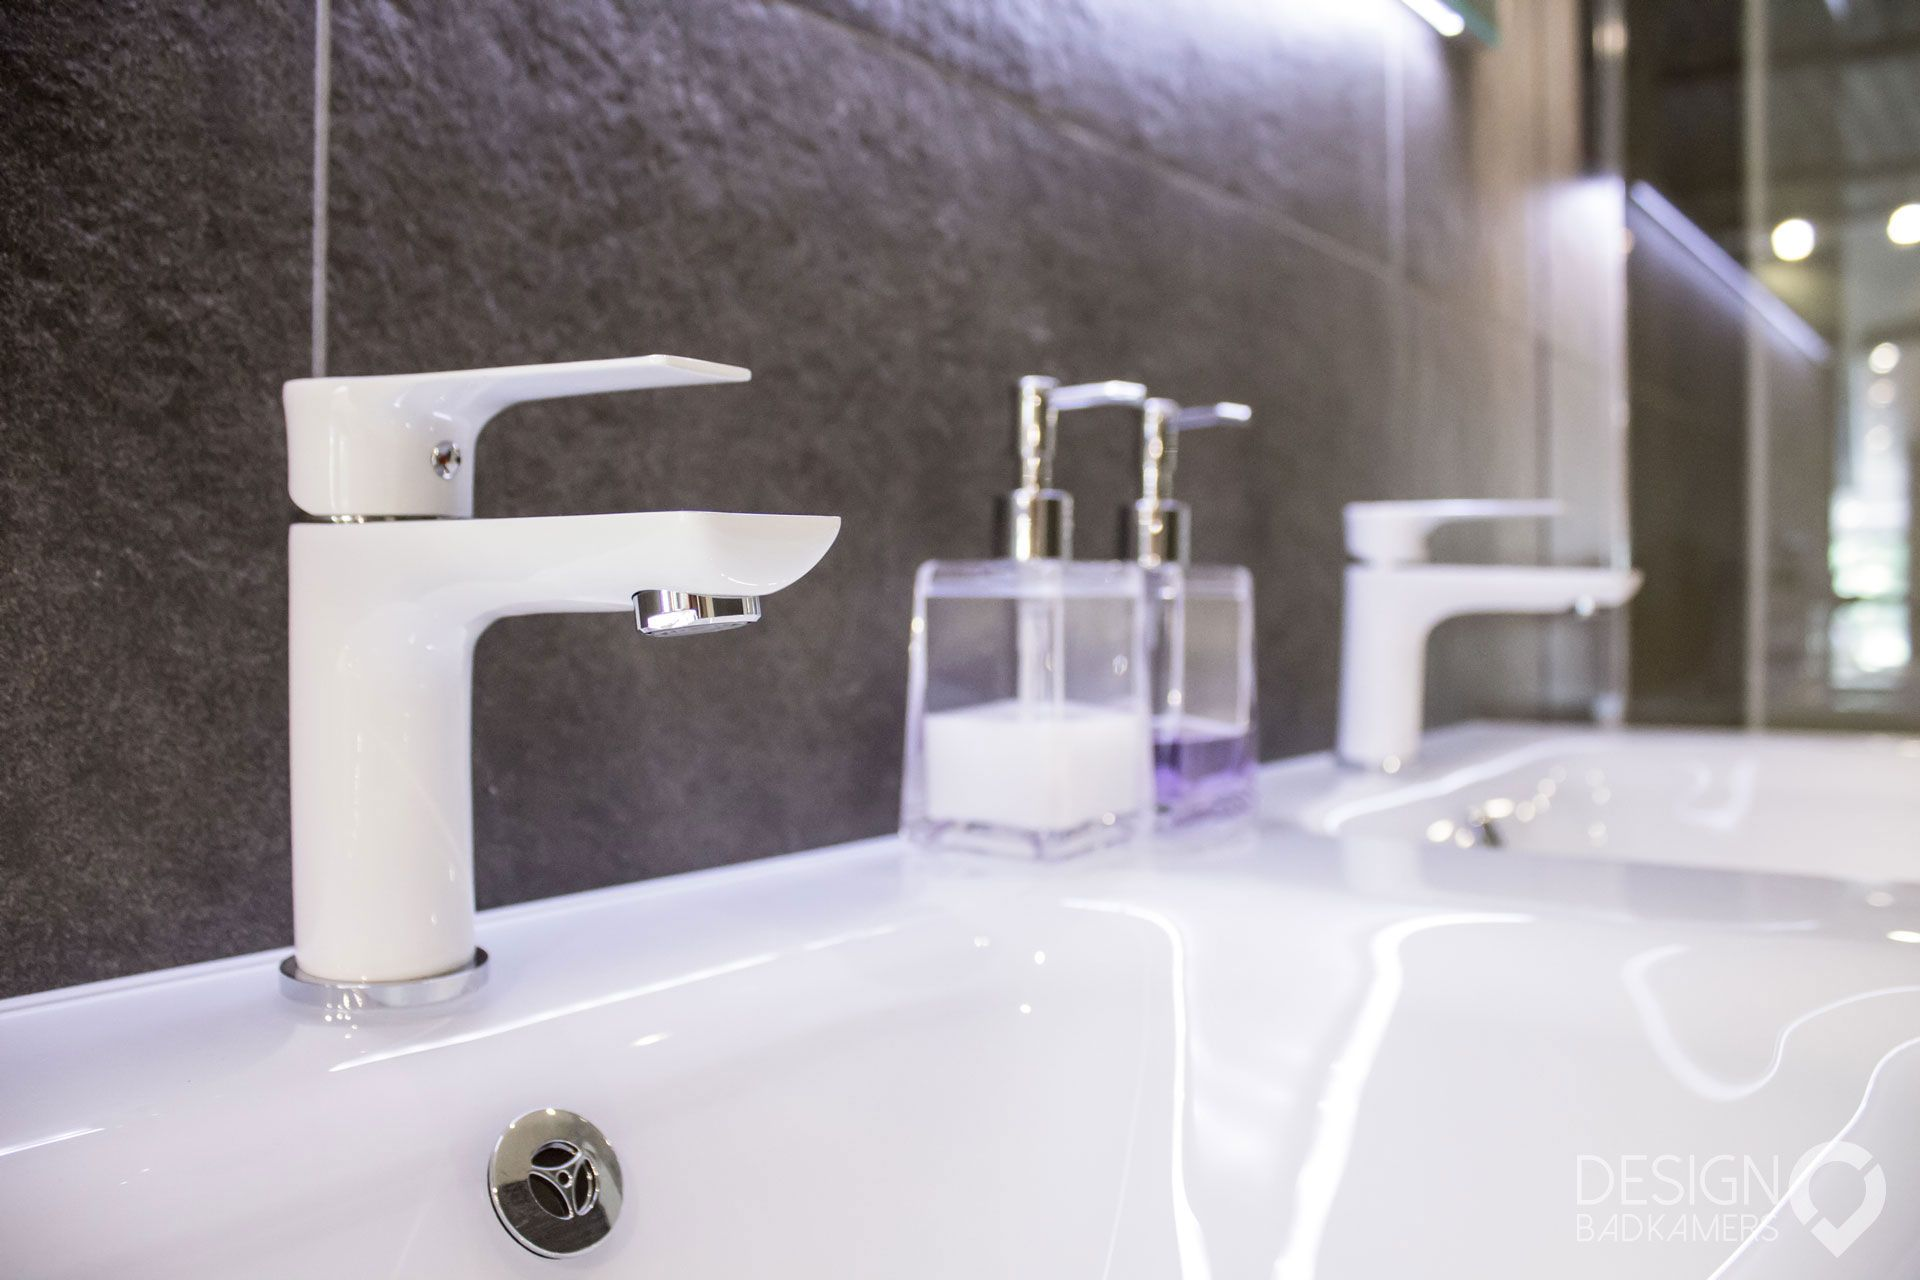 Elegant badkamermeubel met eiken vloer gebruikt badkamermeubels